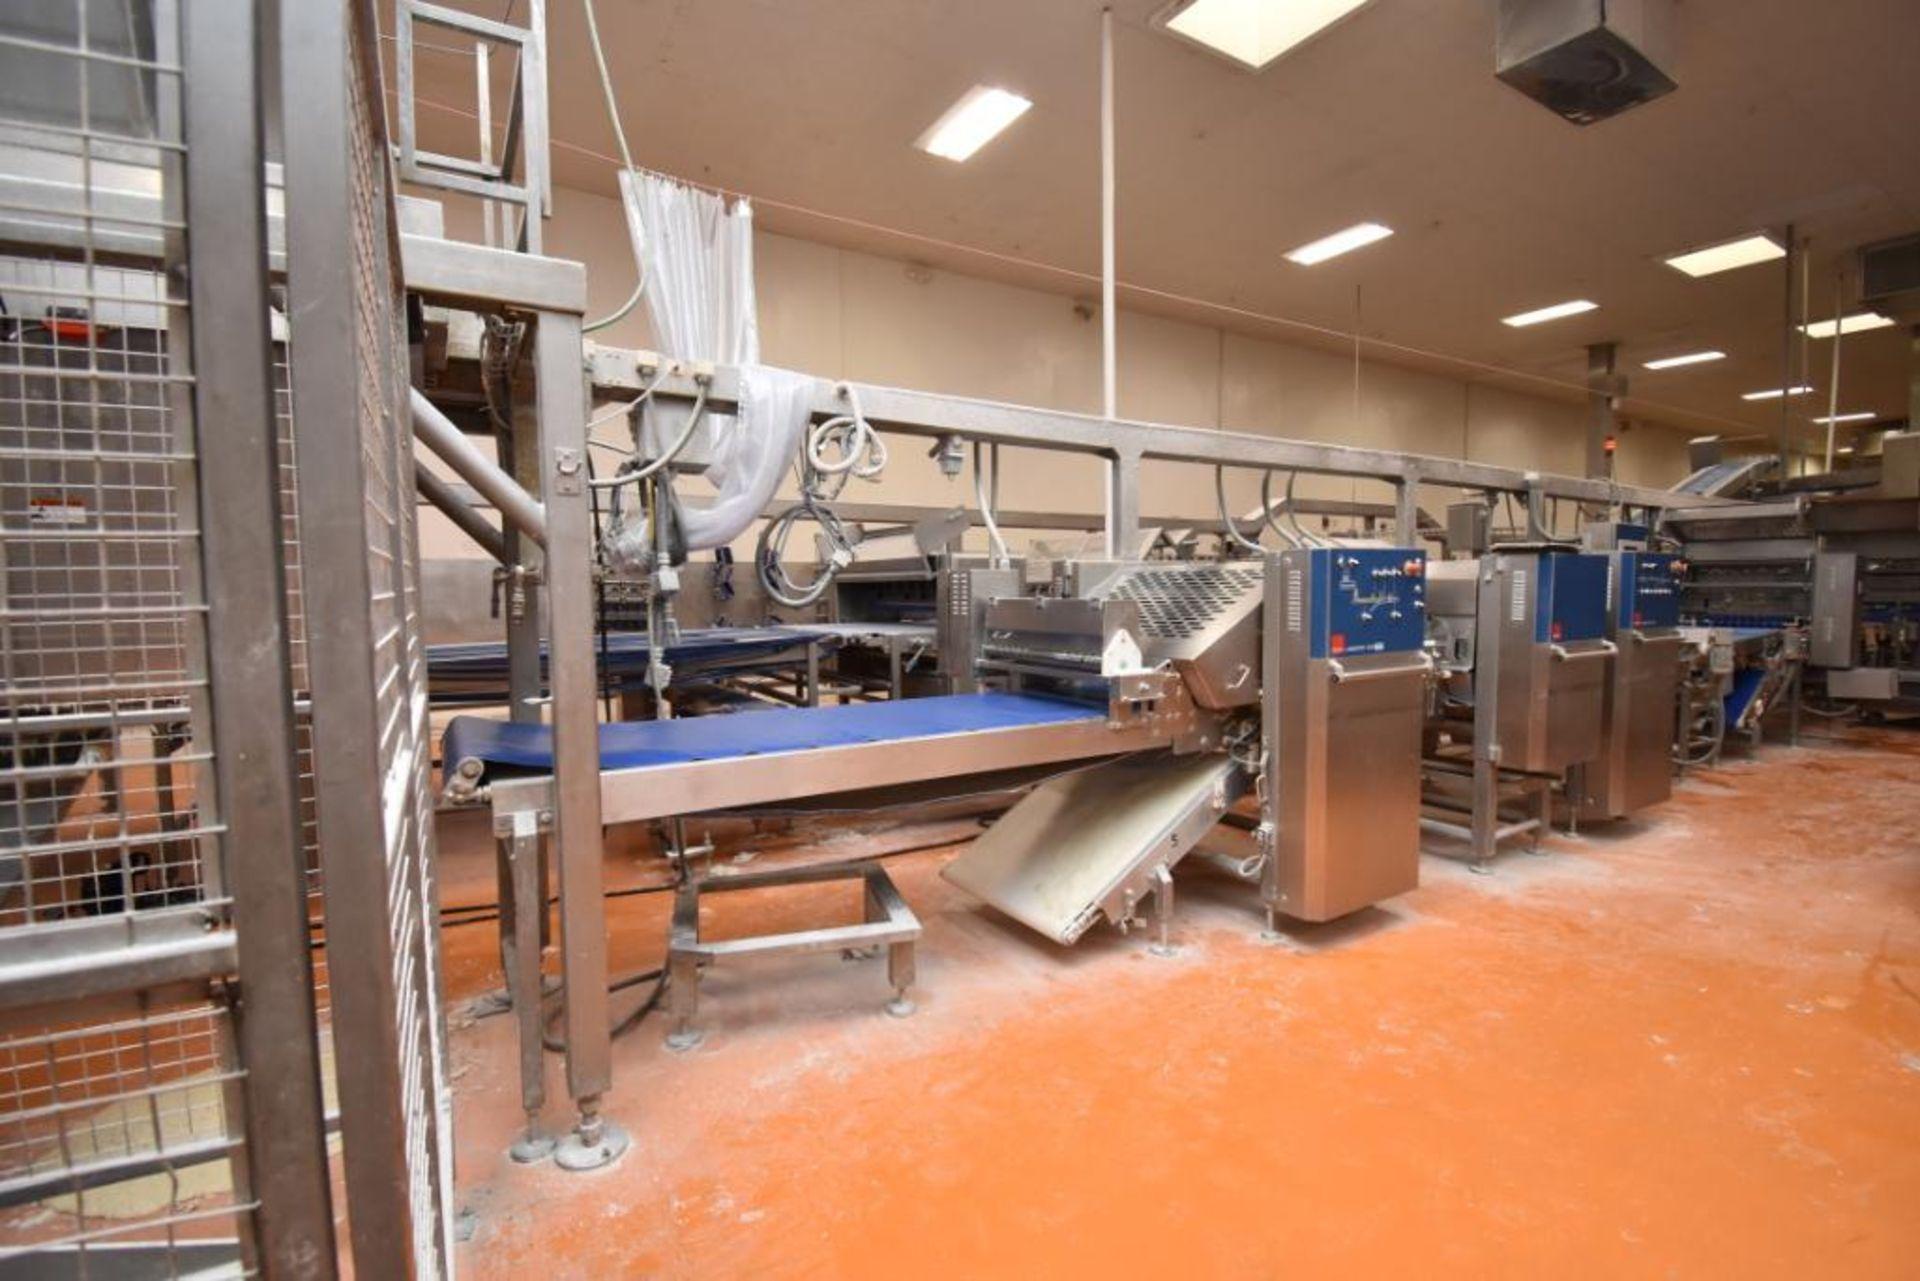 2007 Fritsch Laminator 3000 dough line - Image 53 of 280